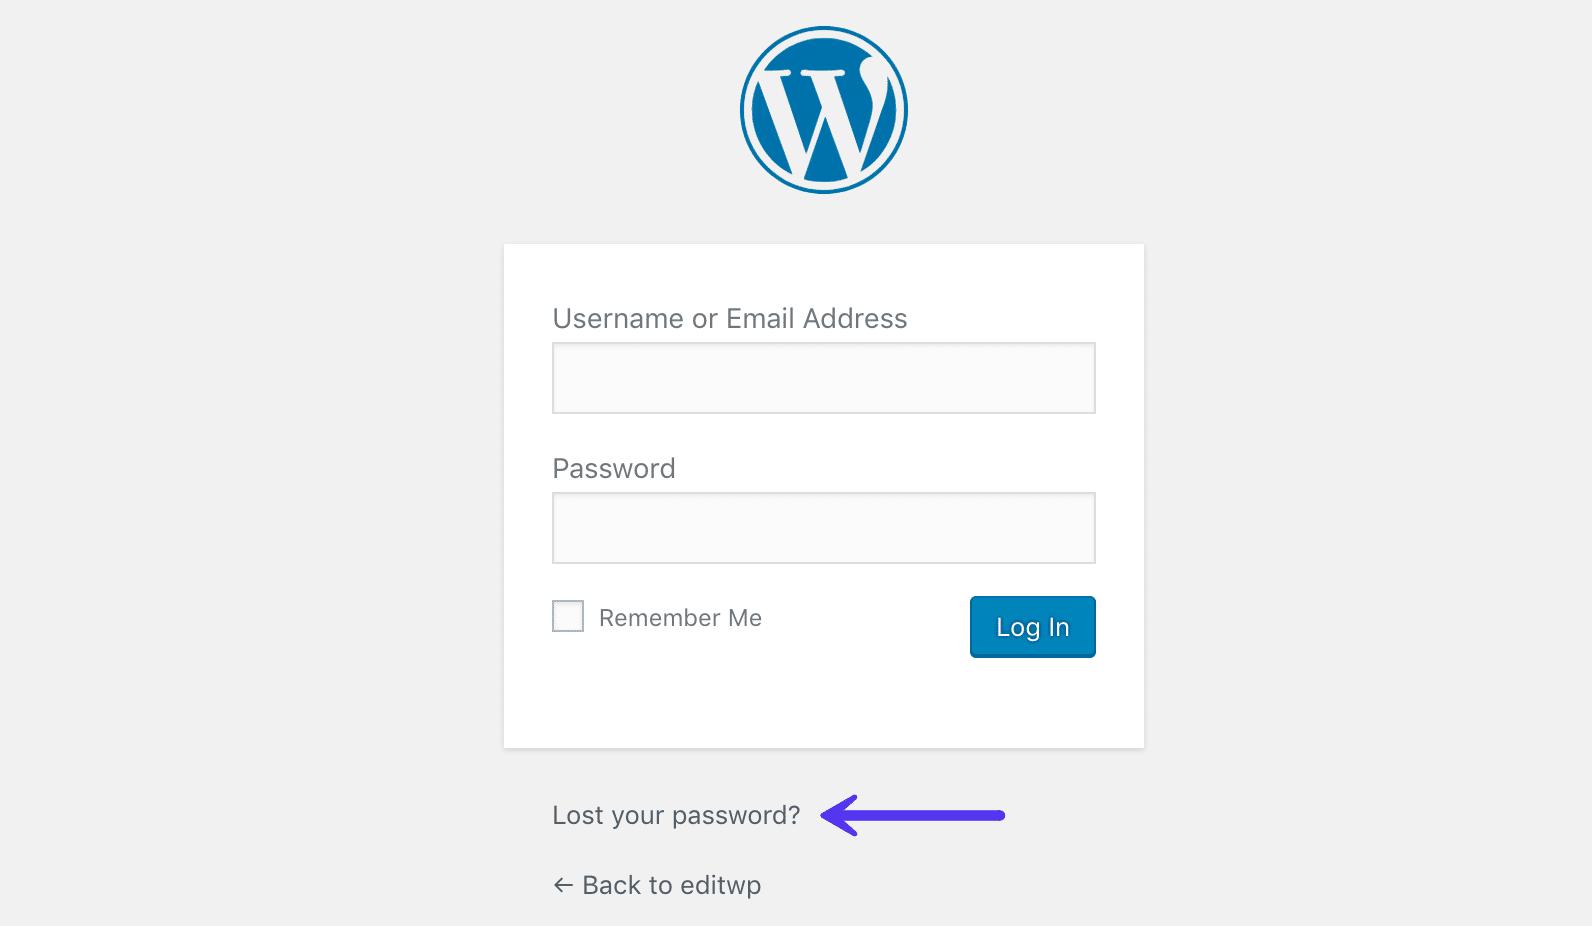 Mistet dit password